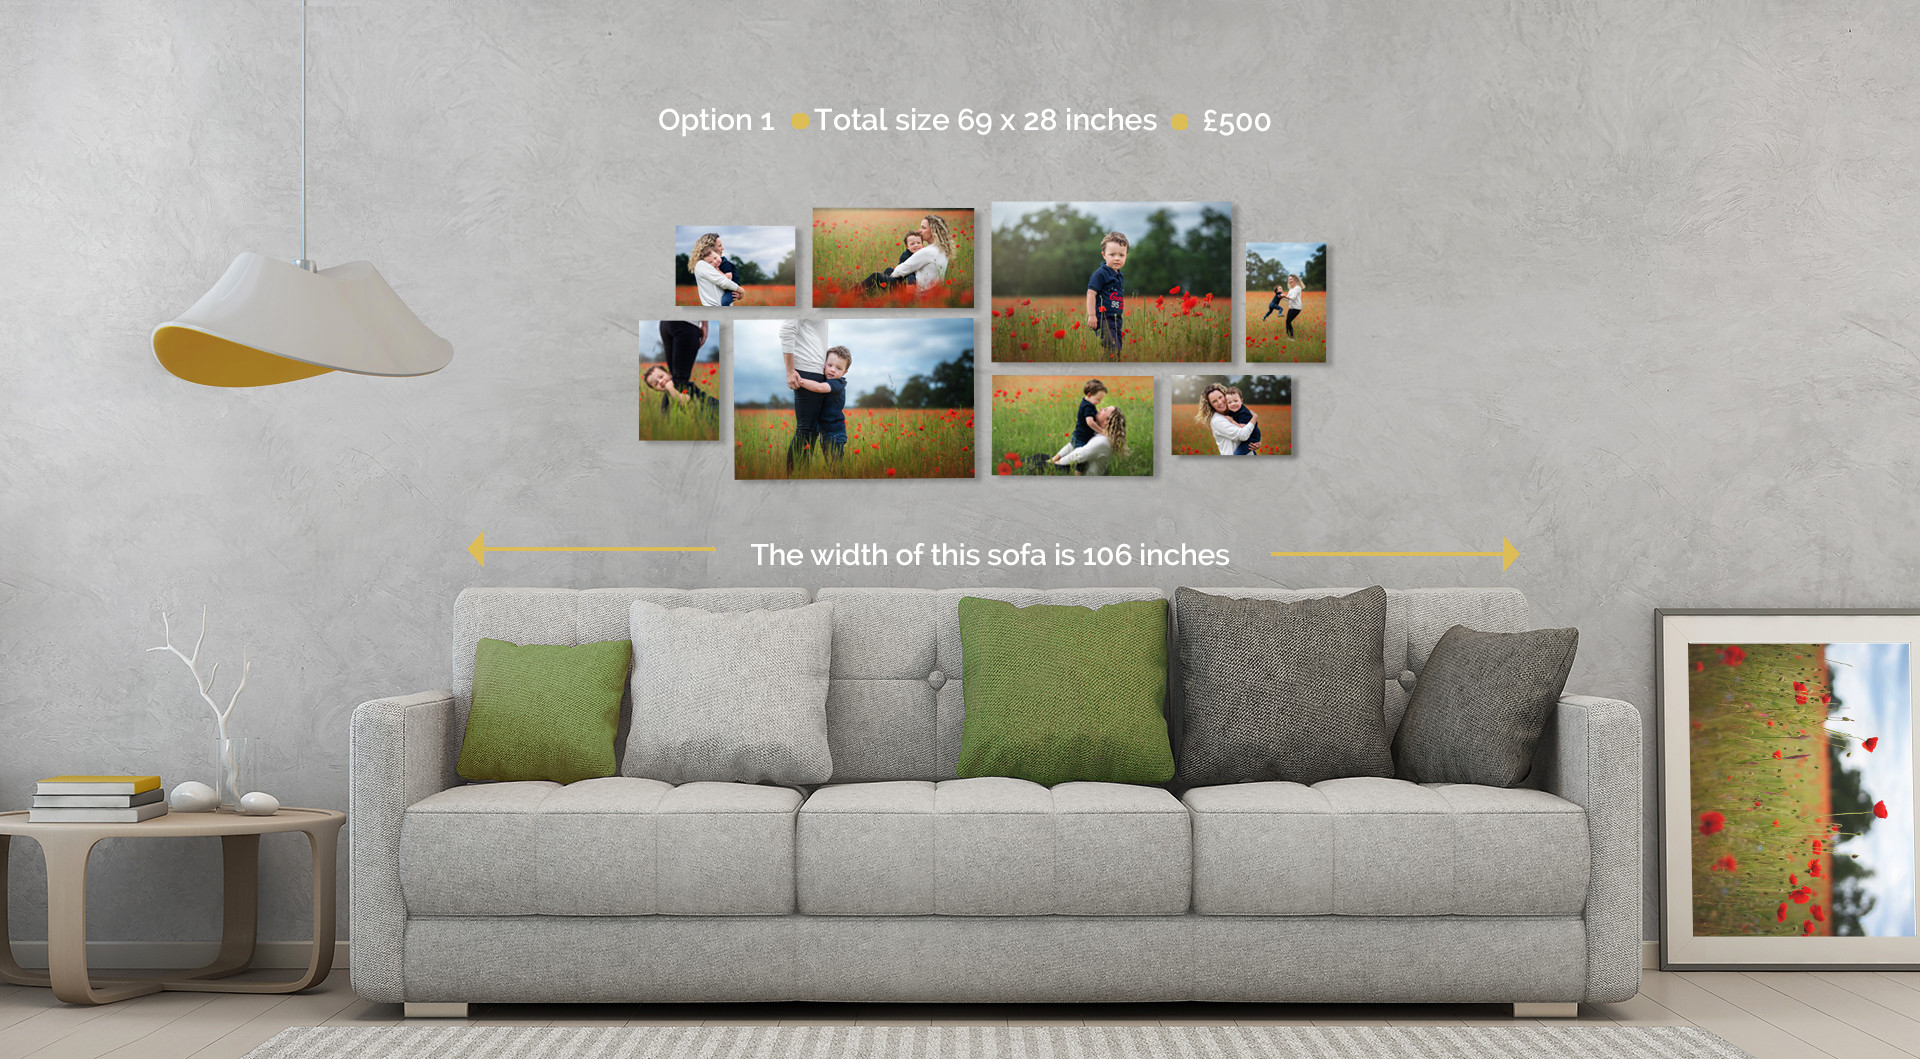 Canvas-gallery-option-1.jpg